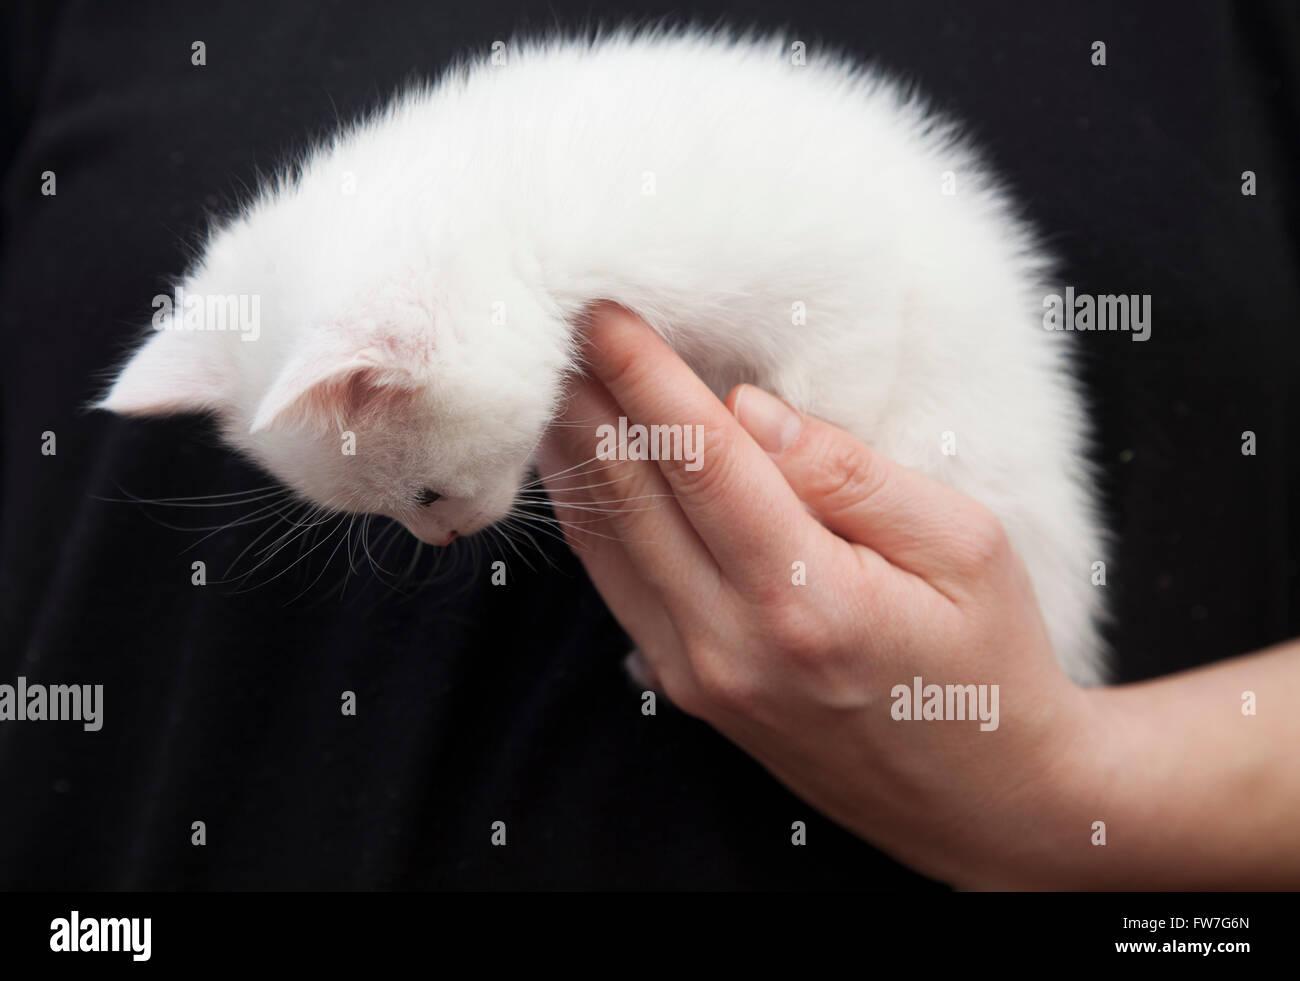 Cat, animales domésticos, tierna, dulce, relajante Imagen De Stock